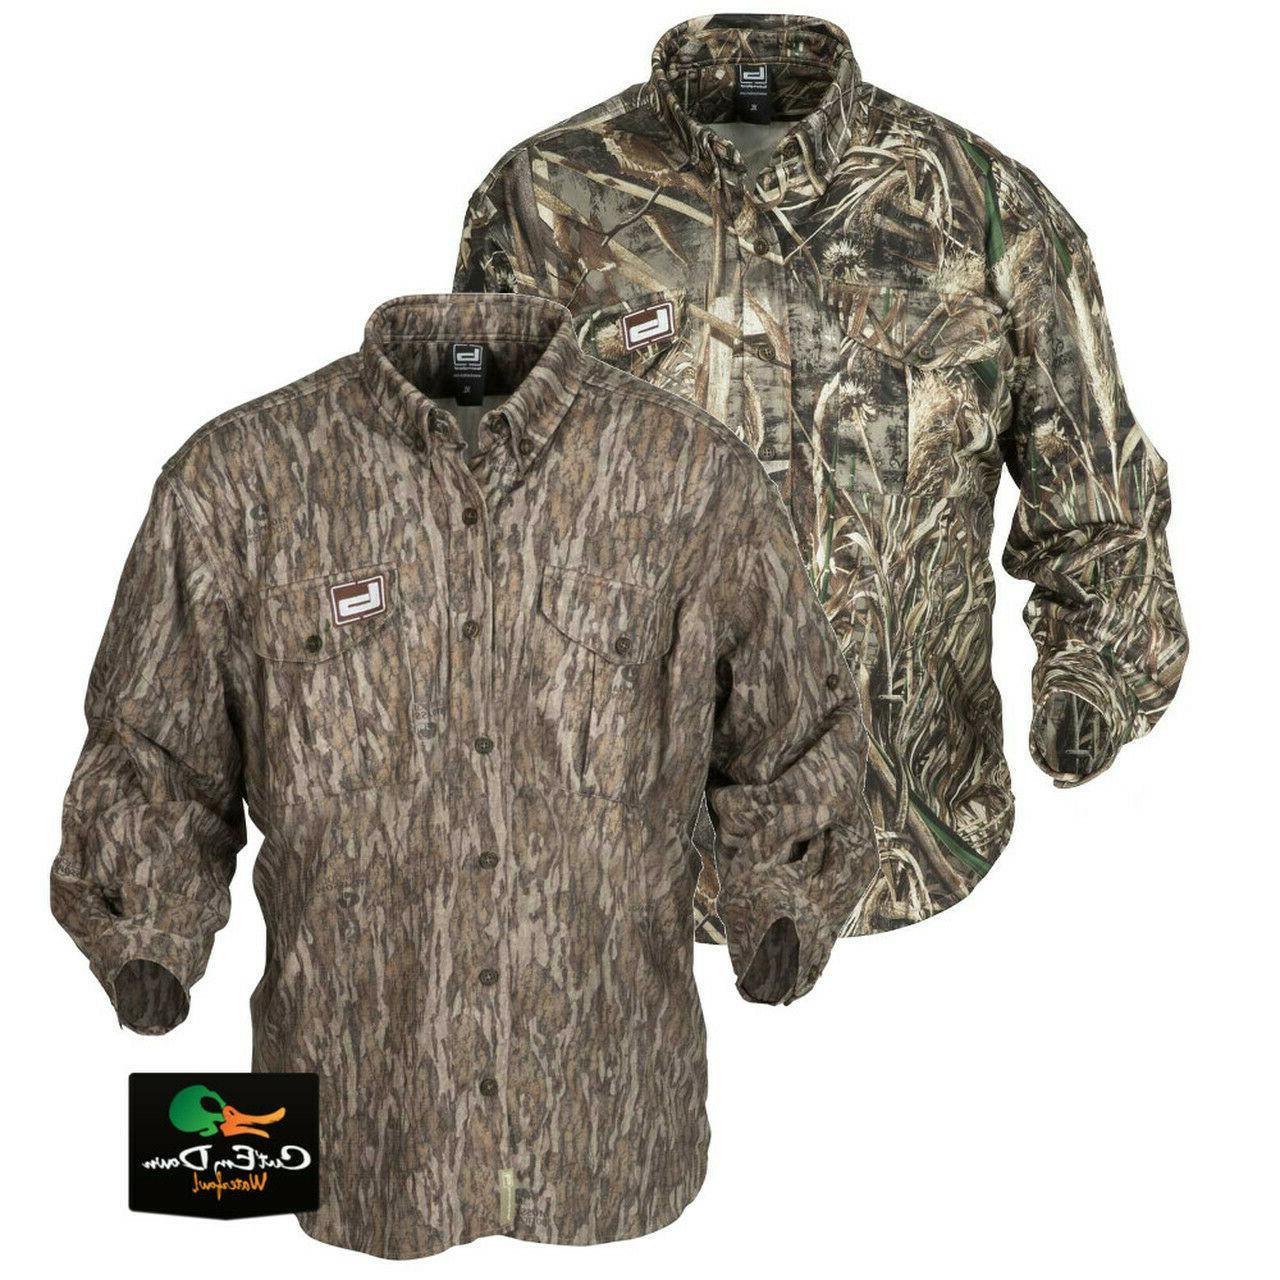 new gear tec fleece jac shirt long